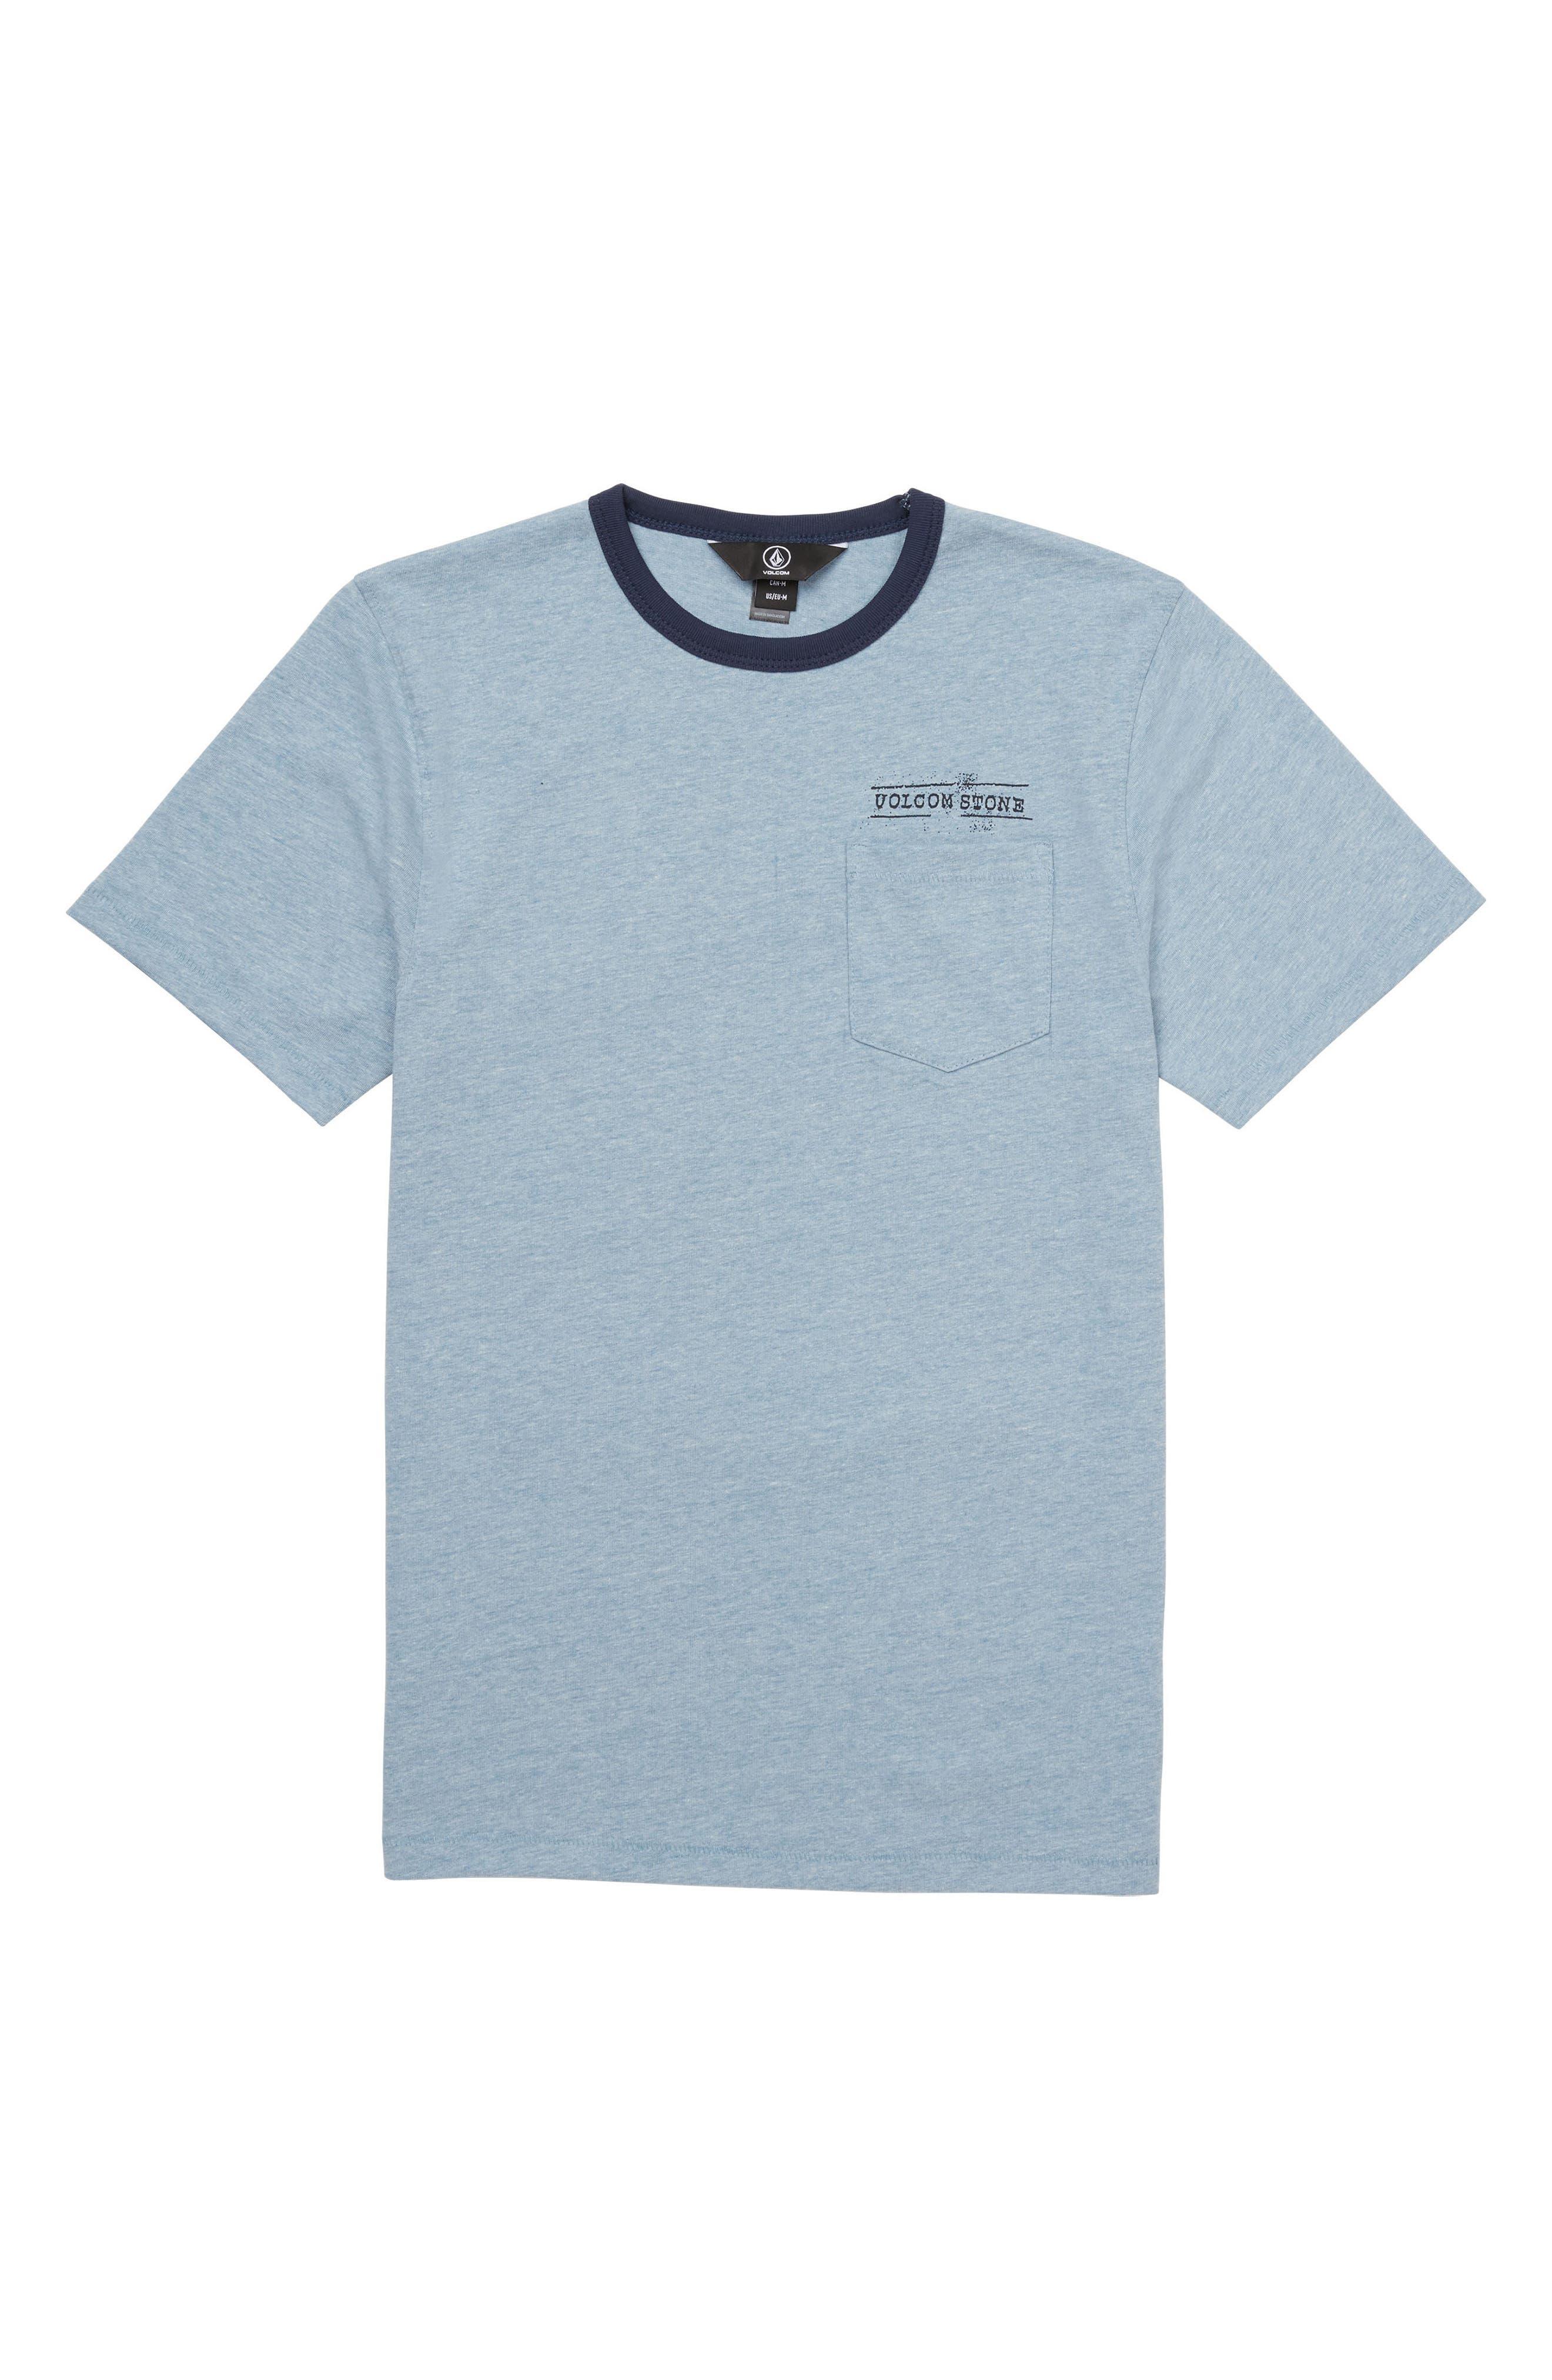 Point Place Crewneck T-Shirt,                             Main thumbnail 1, color,                             Indigo